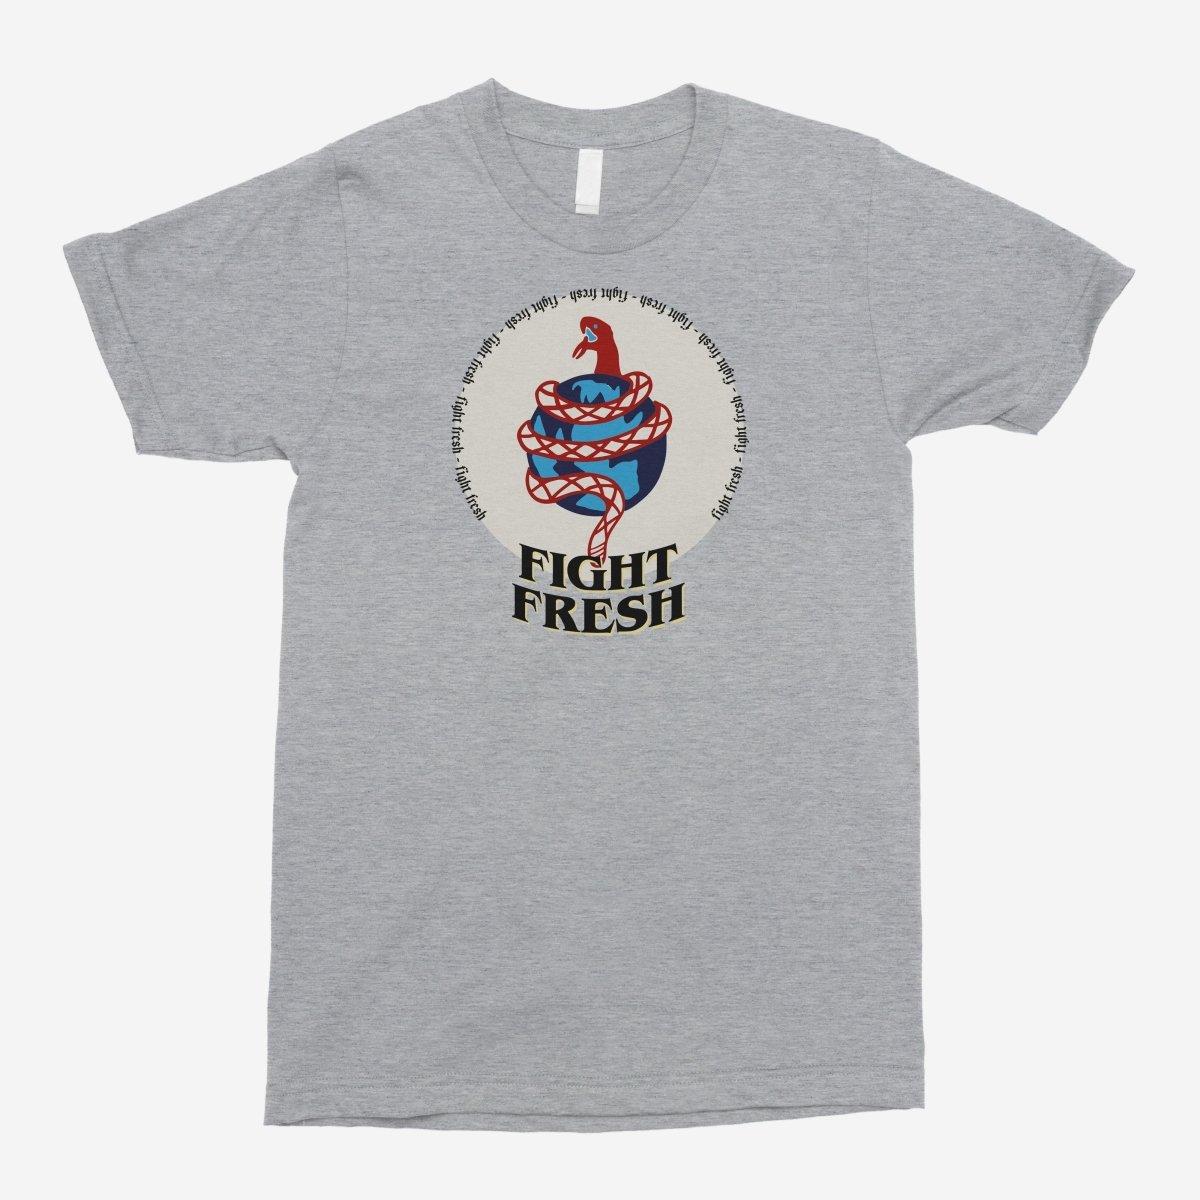 Fight Fresh - Snaked Globe Unisex T-Shirt